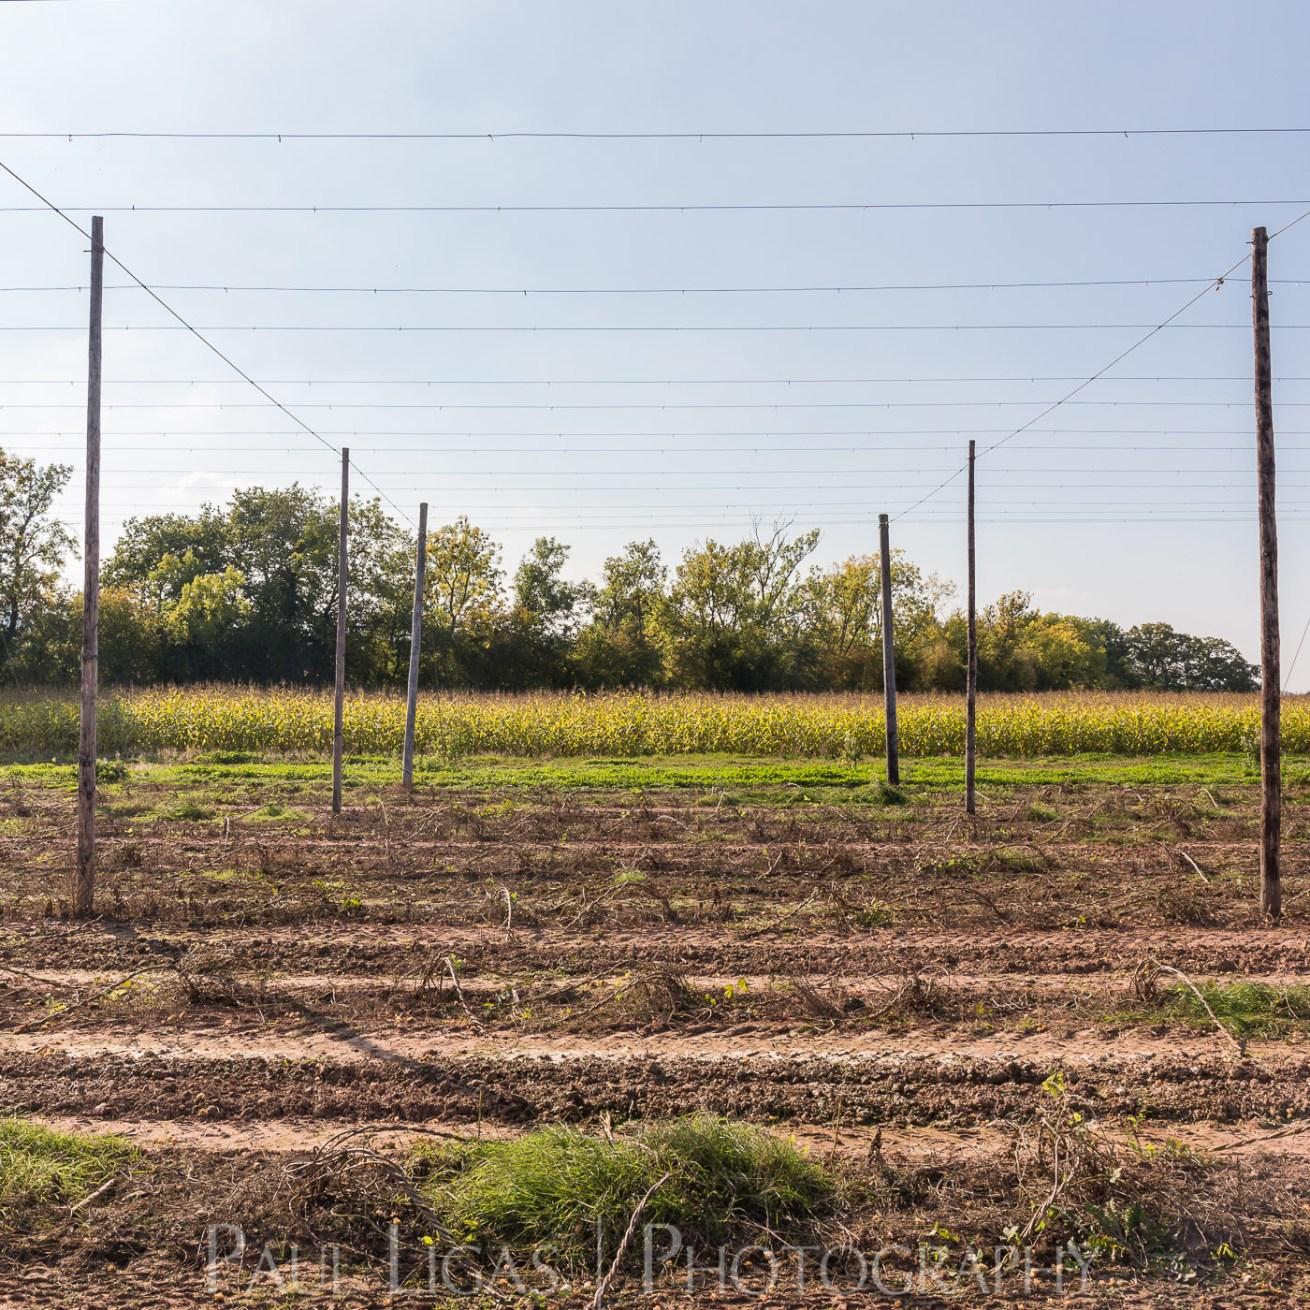 General Public, Ledbury, Herefordshire farming agriculture photographer photography The Hop Project hop wires landscape 1796